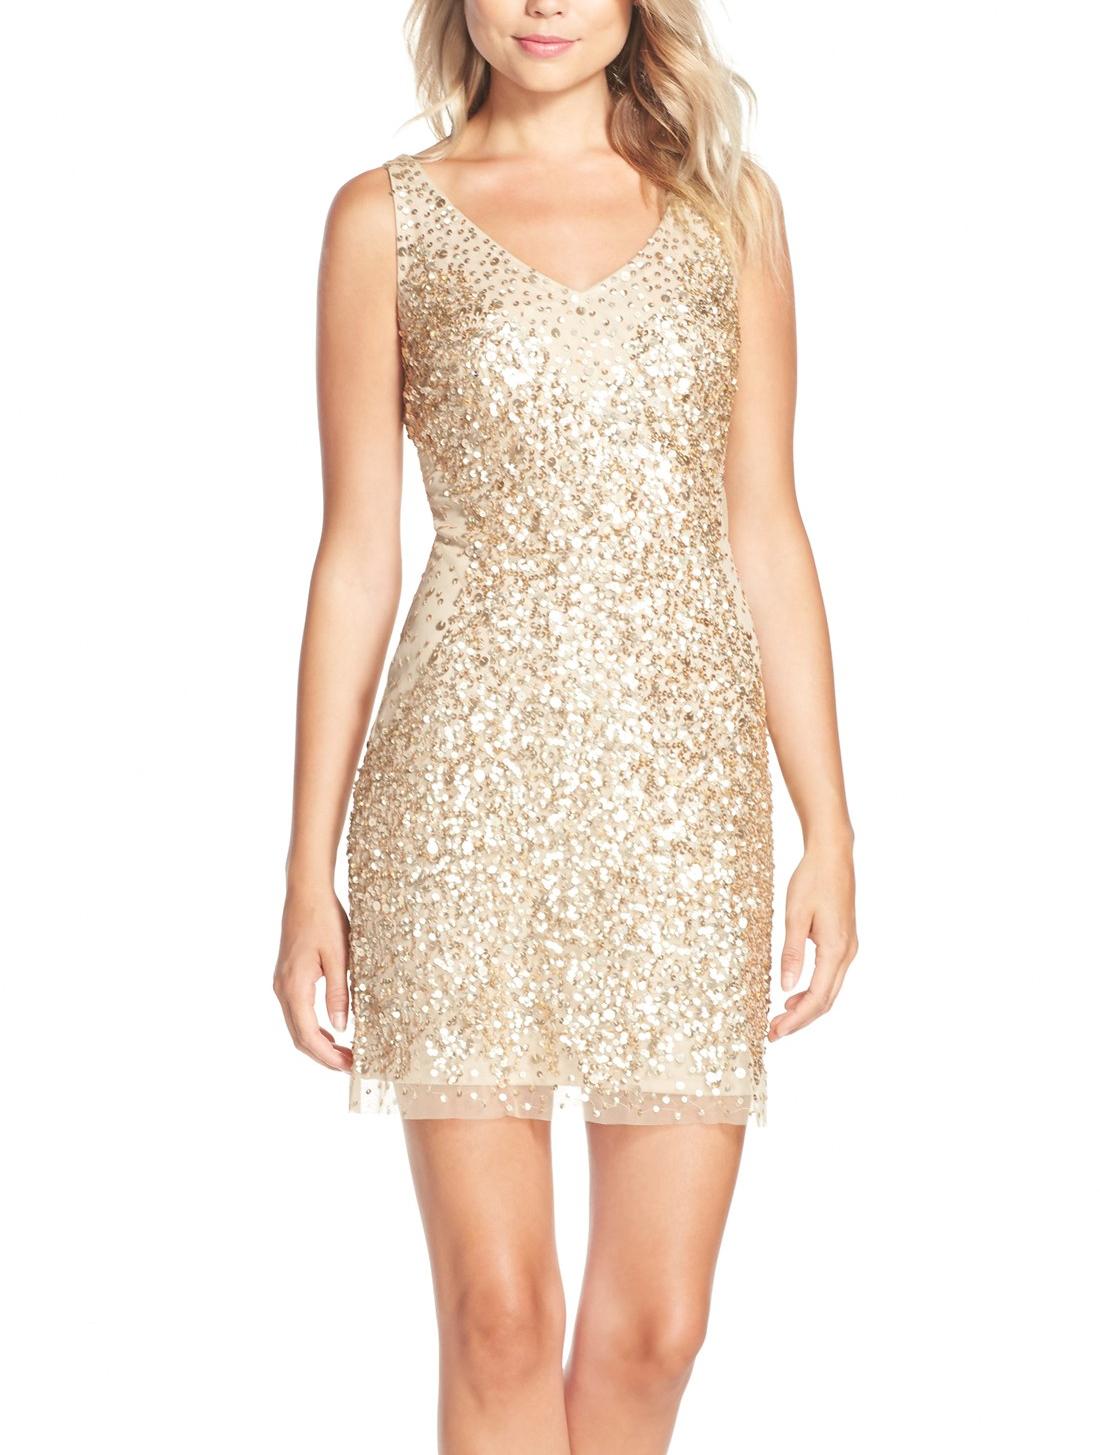 Allover gold metallic sequins make this flattering dress a statement ...